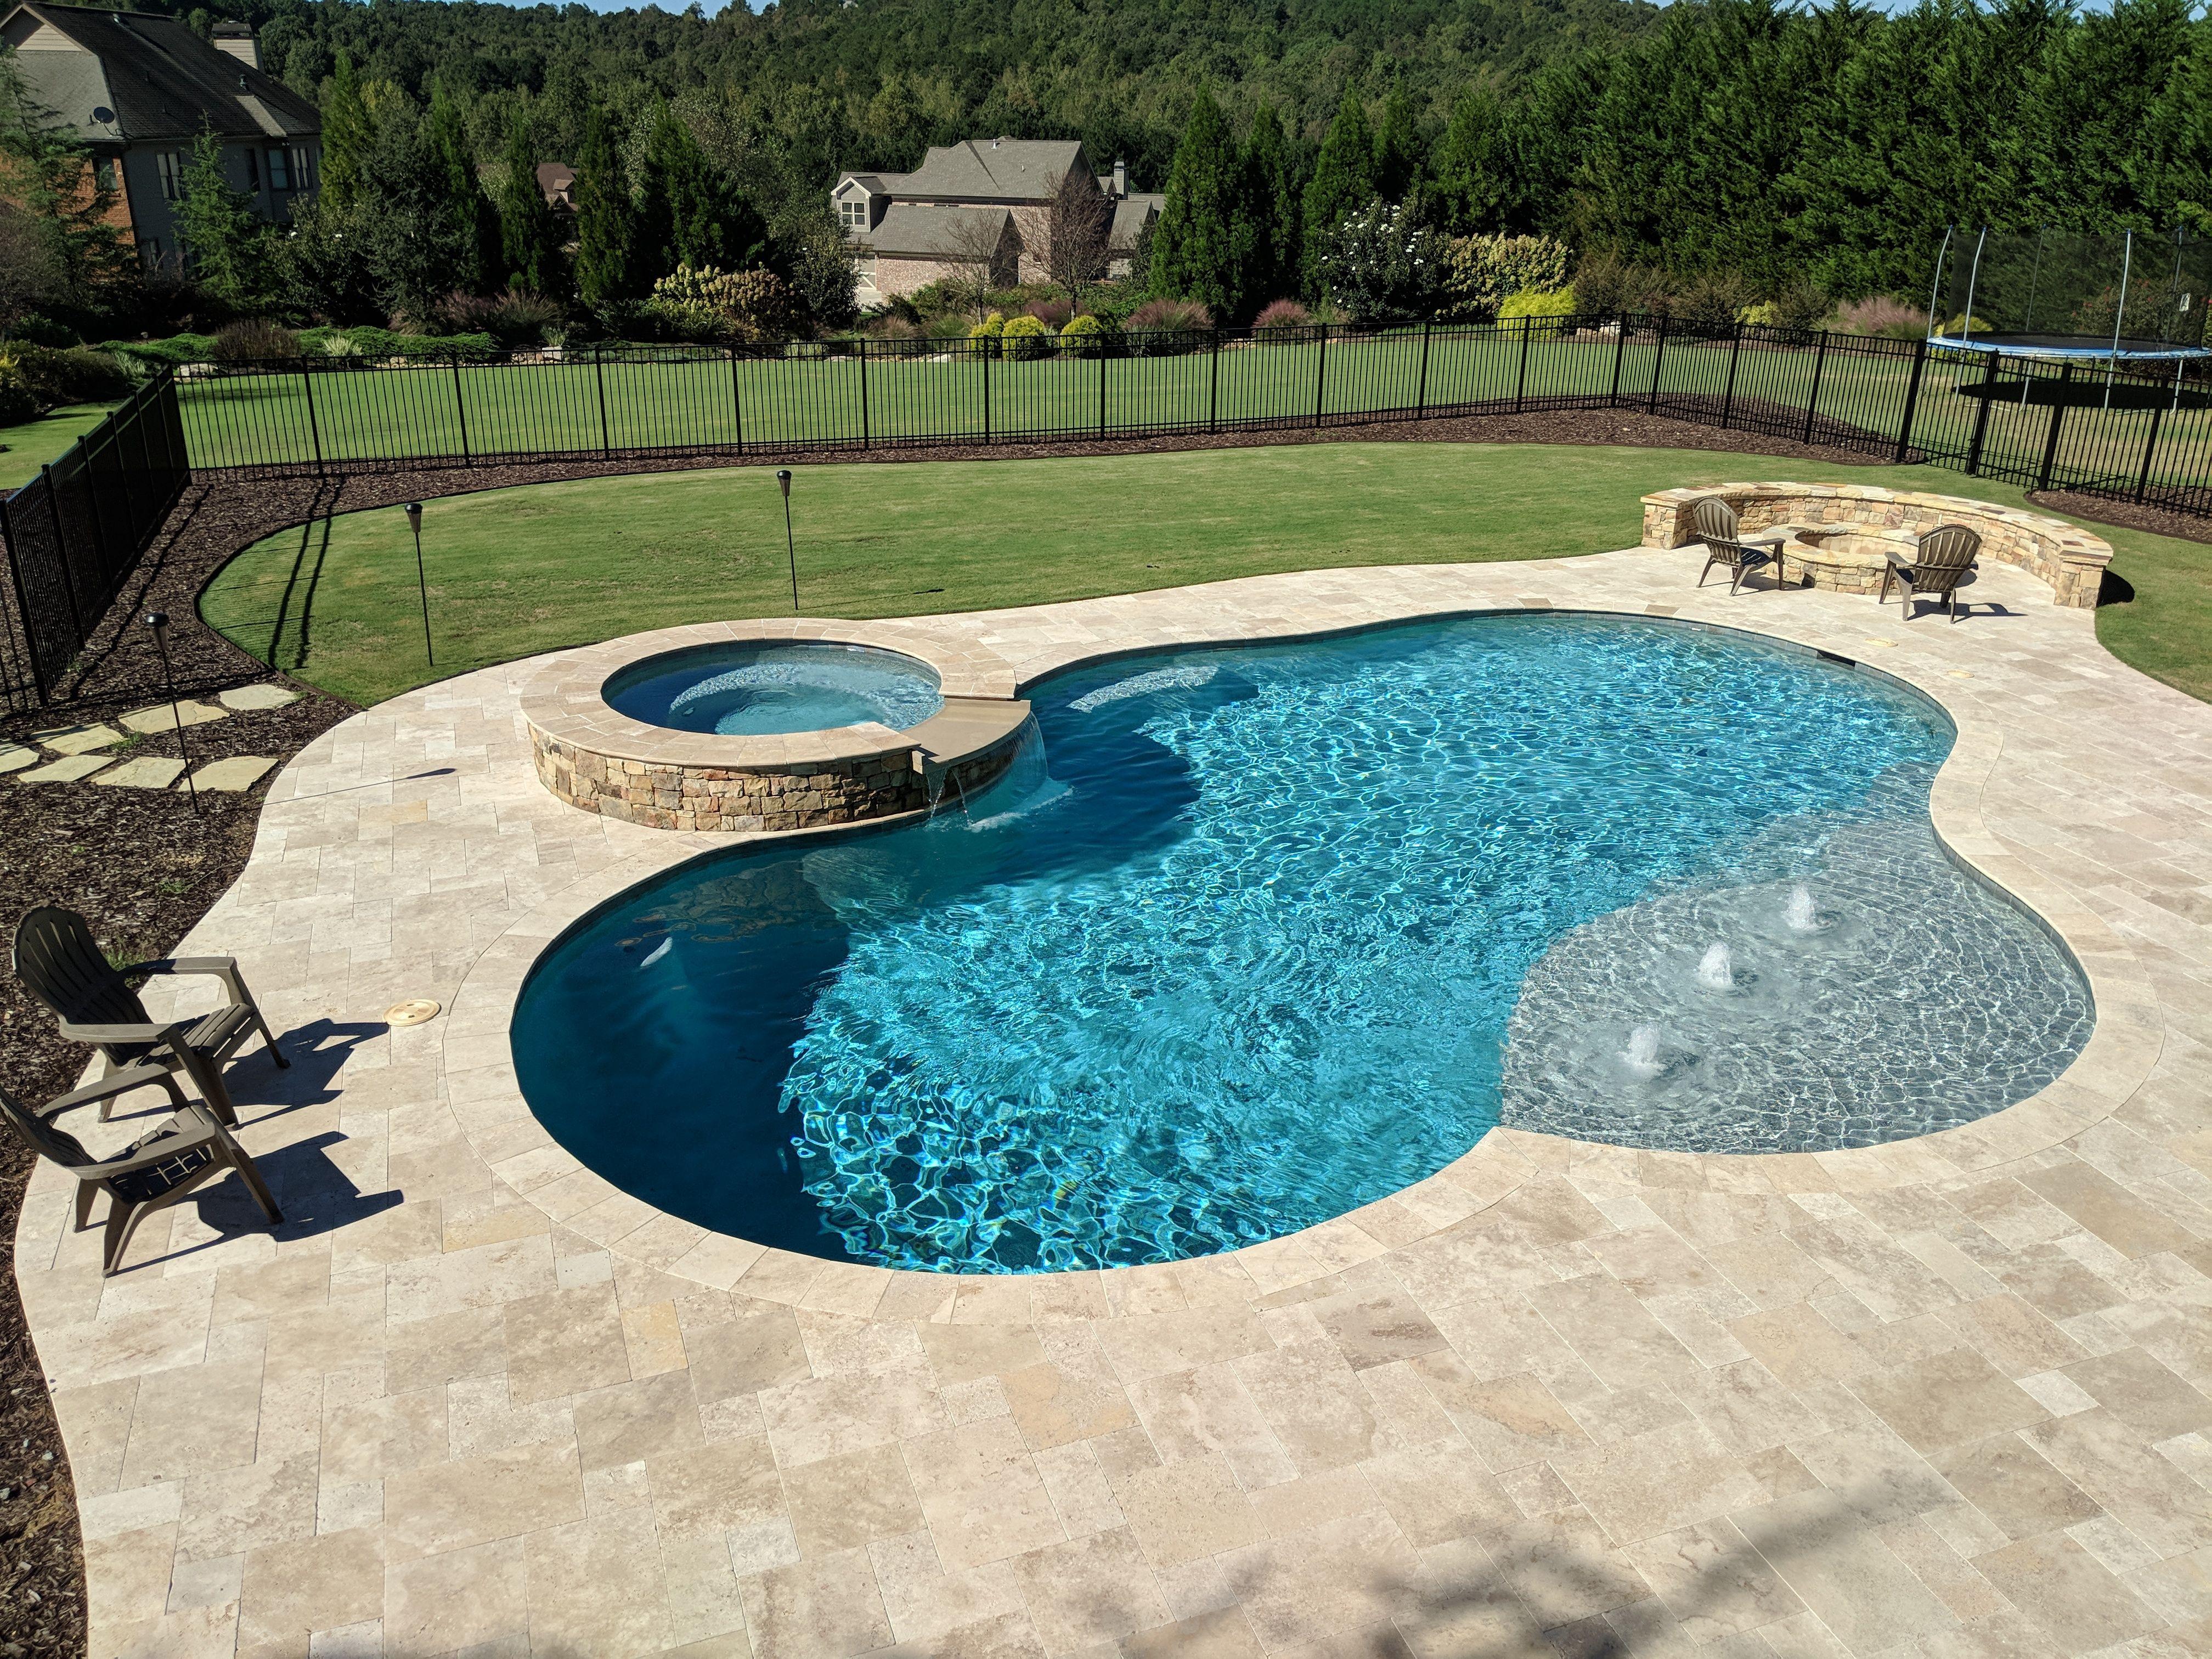 Freeform Pool With Raised Spa And Ivory Travertine Coping And Spa Custom Swimming Pool Pools Backyard Inground Backyard Pool Landscaping